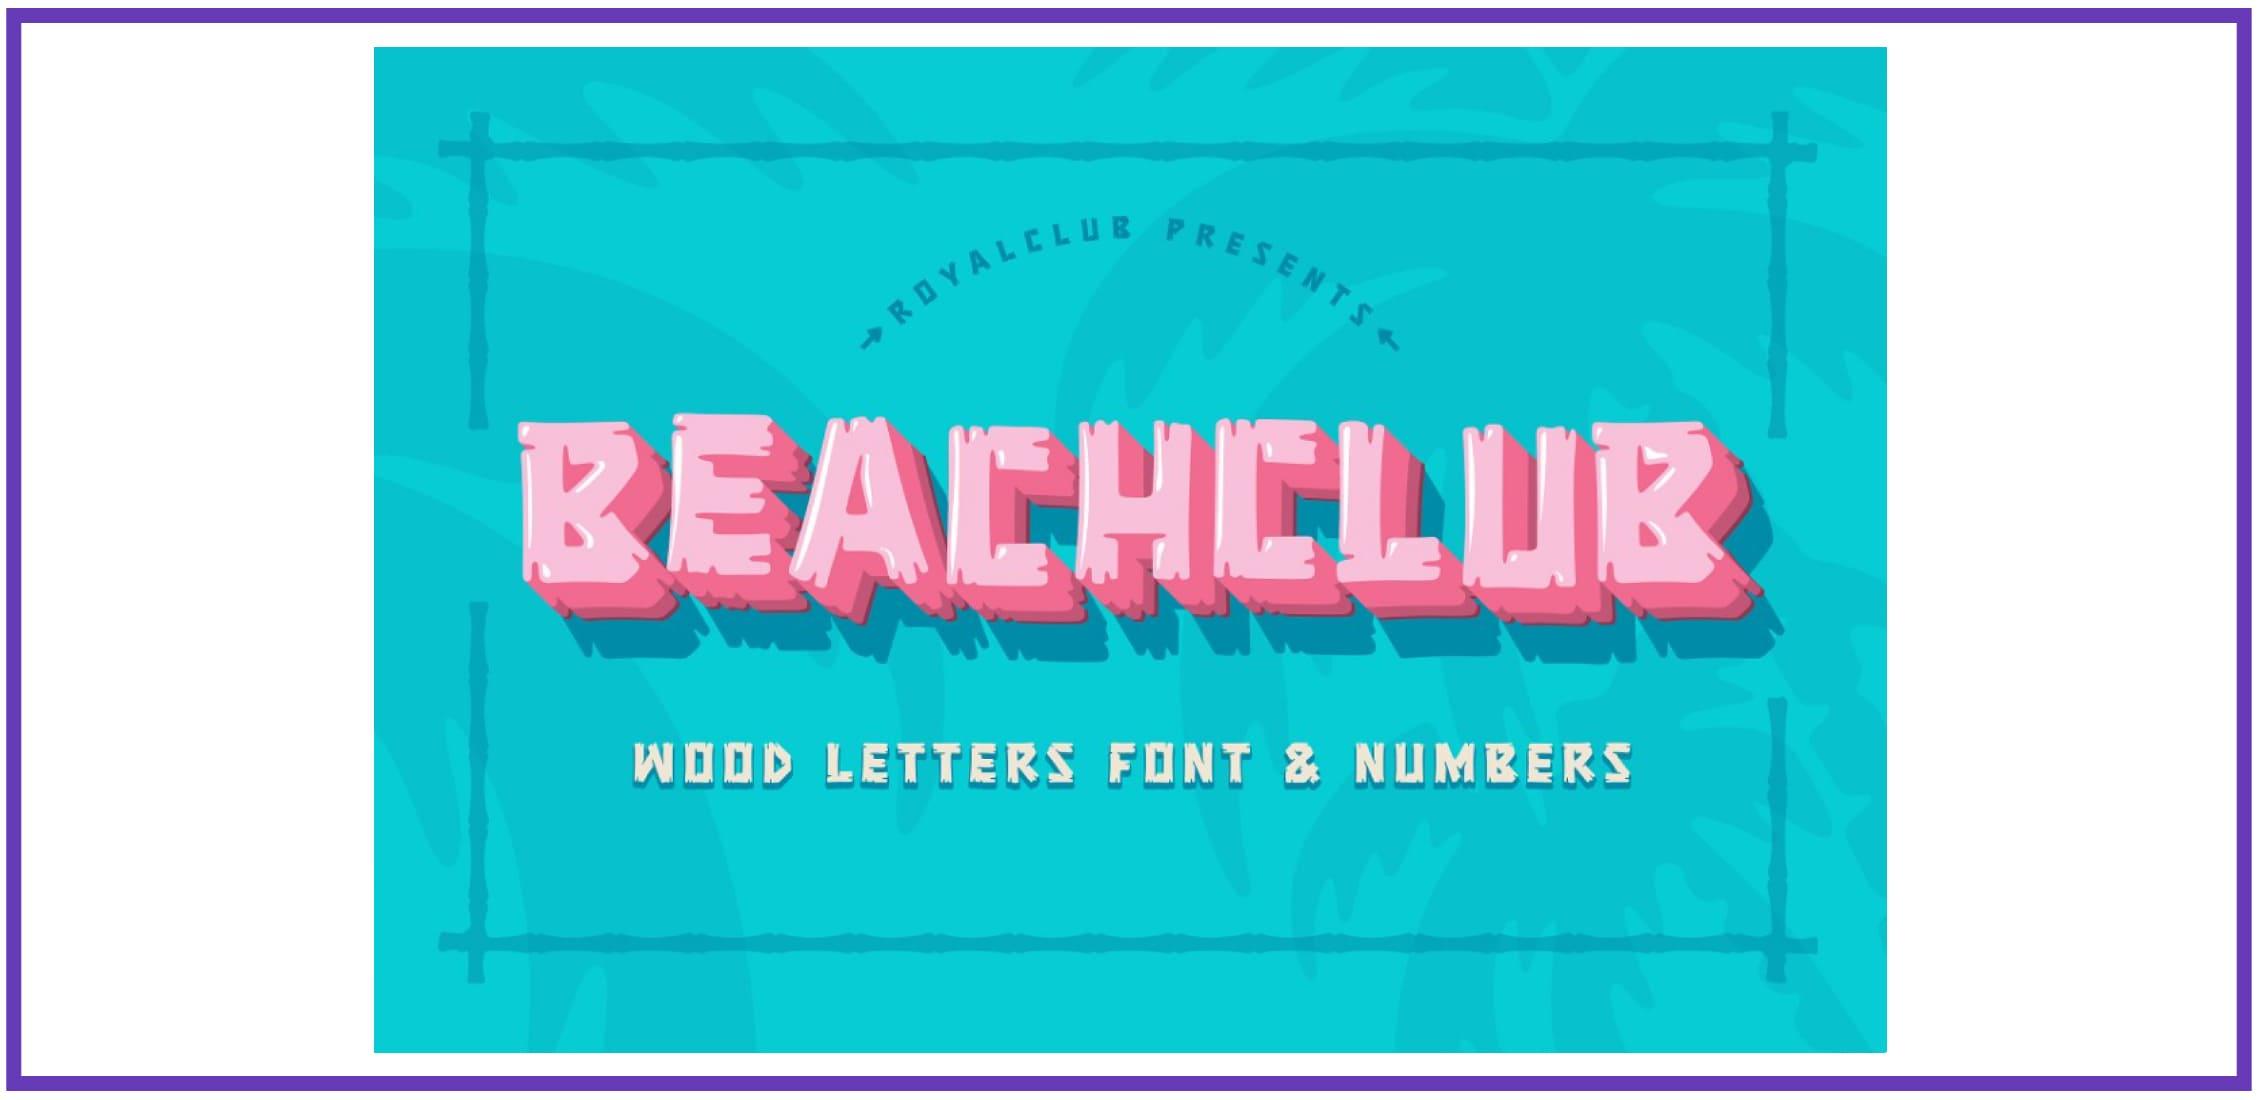 BEACHCLUB FONT By ROYALCLUB. Best Beachy Fonts.